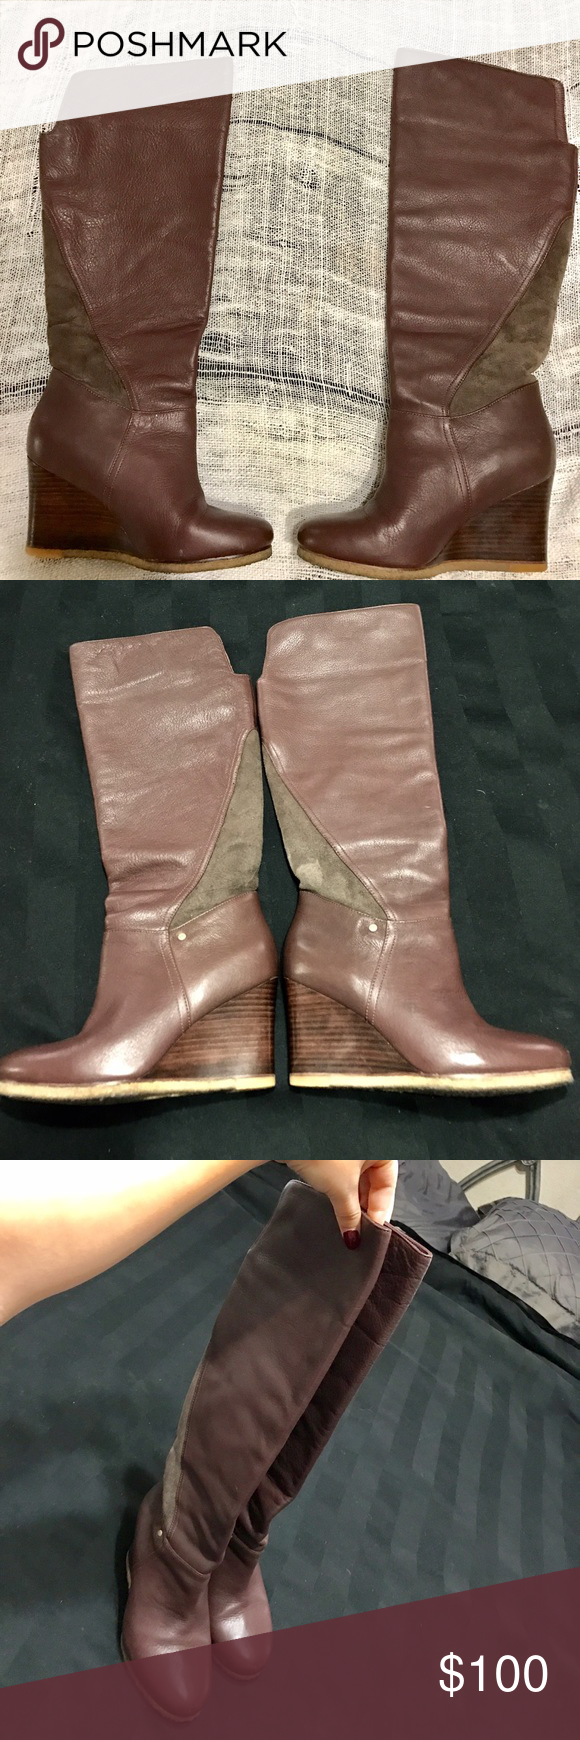 bb5c1858b941 Ugg Ravenna Leather Boots Size 7.5